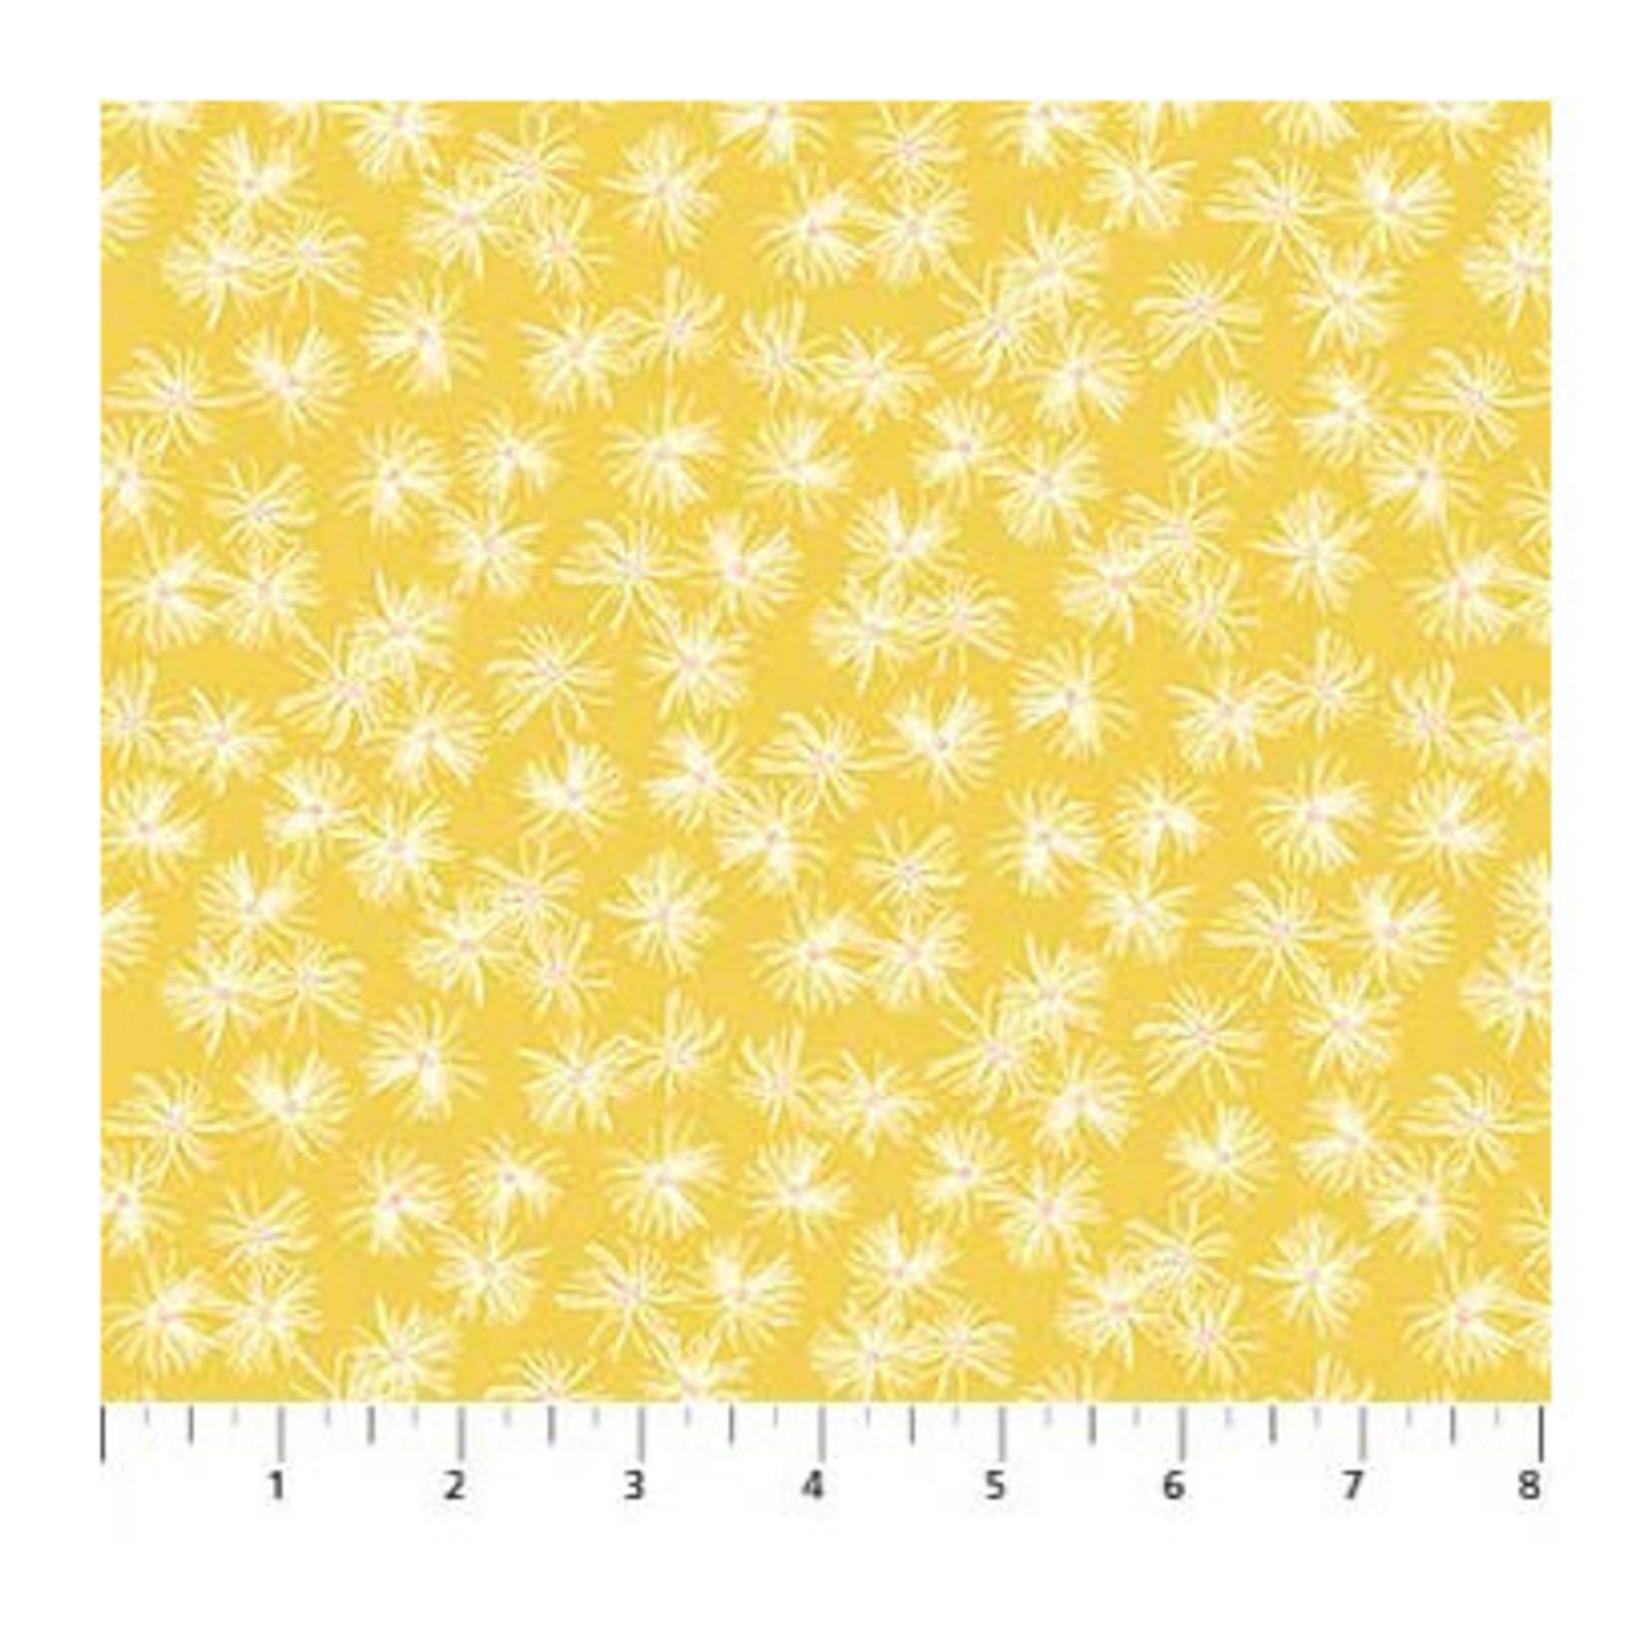 Figo Fabrics Mountain Meadow - Dandelions - Yellow